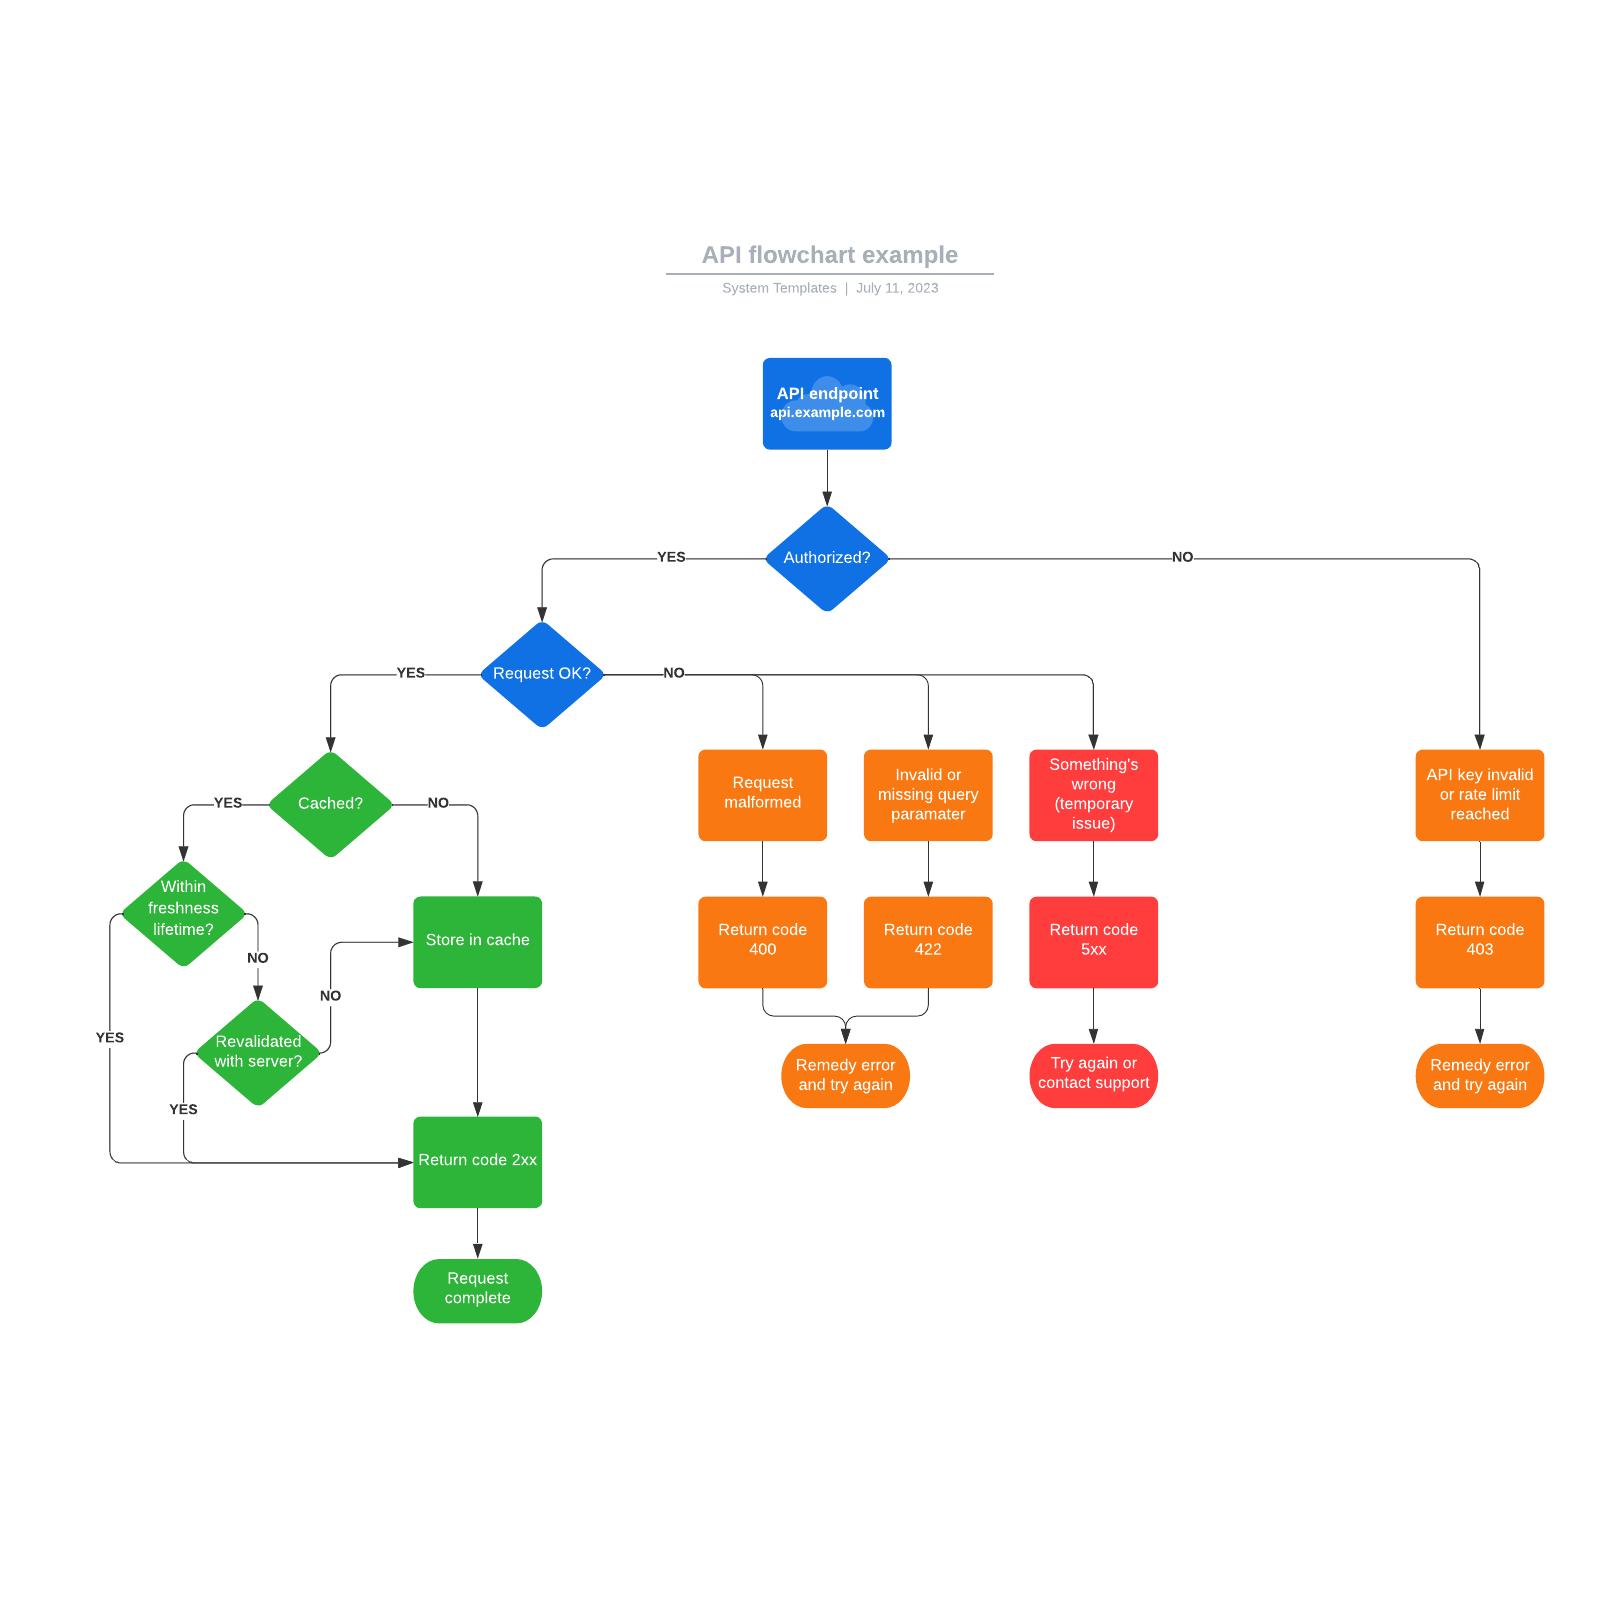 API flowchart example